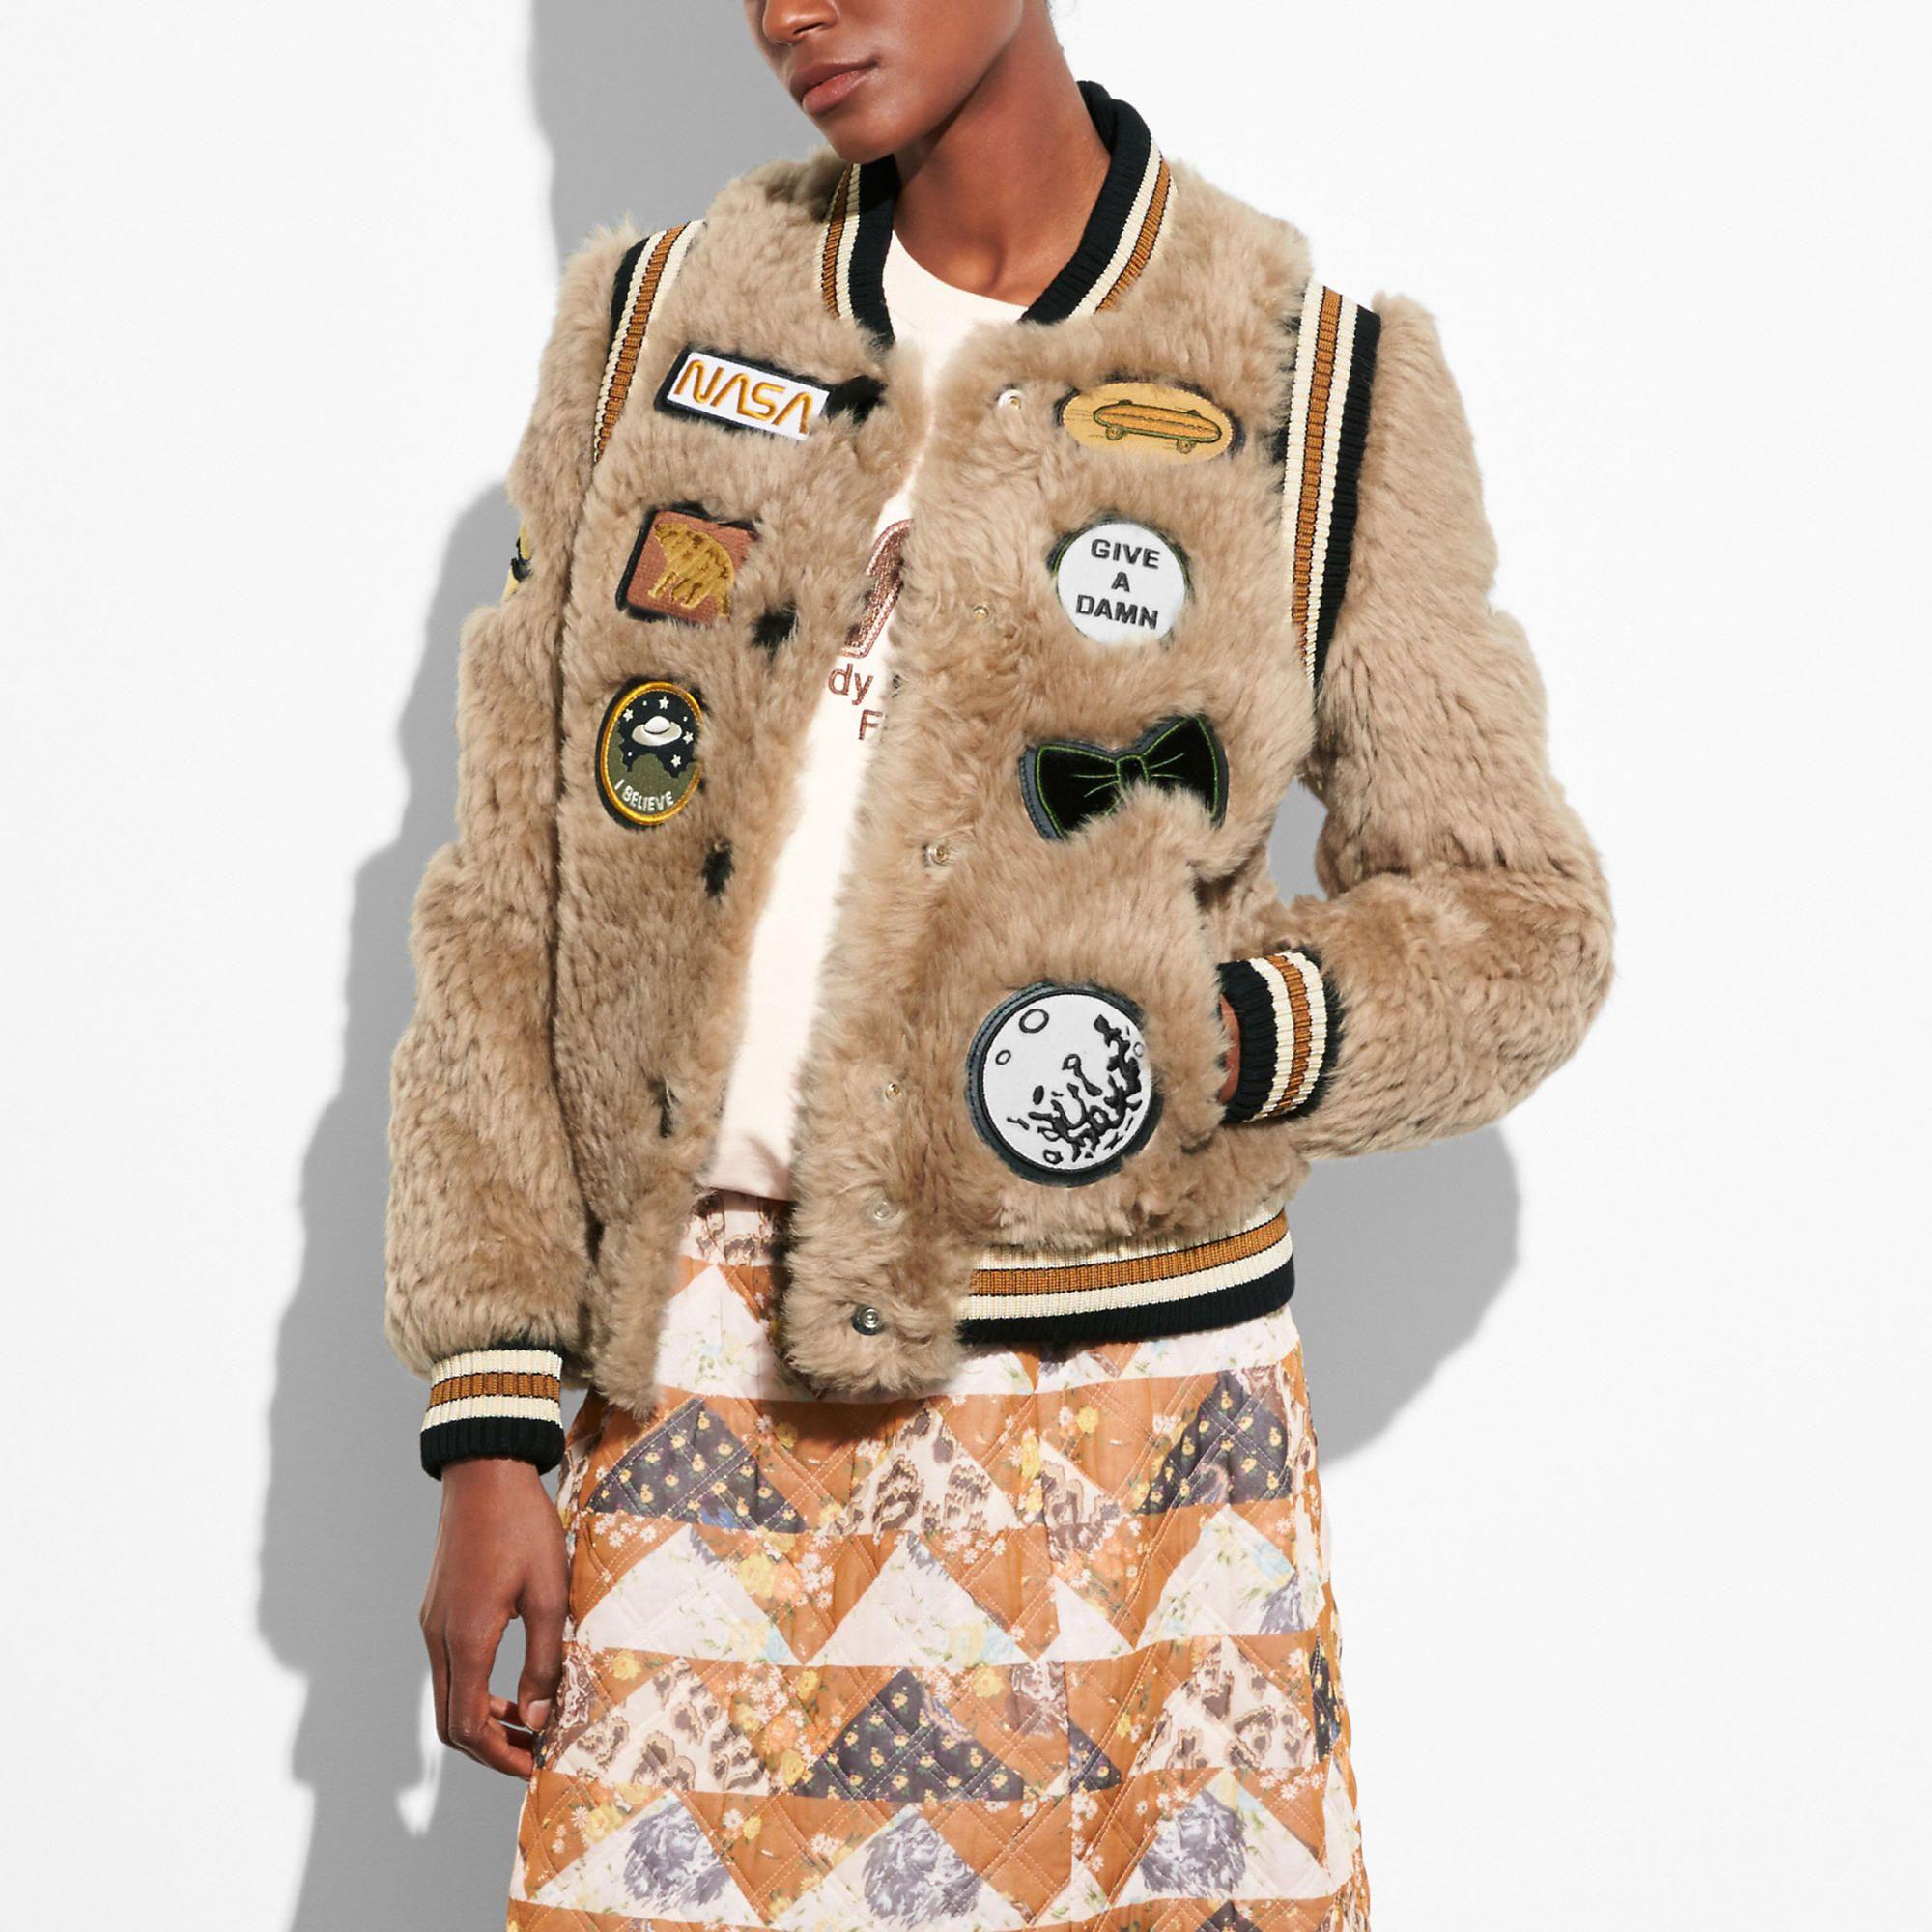 Coach Official Site Designer Handbags Wallets Clothing Menswear Shoes More Varsity Jacket Ski Jacket Women Jackets [ 2000 x 2000 Pixel ]